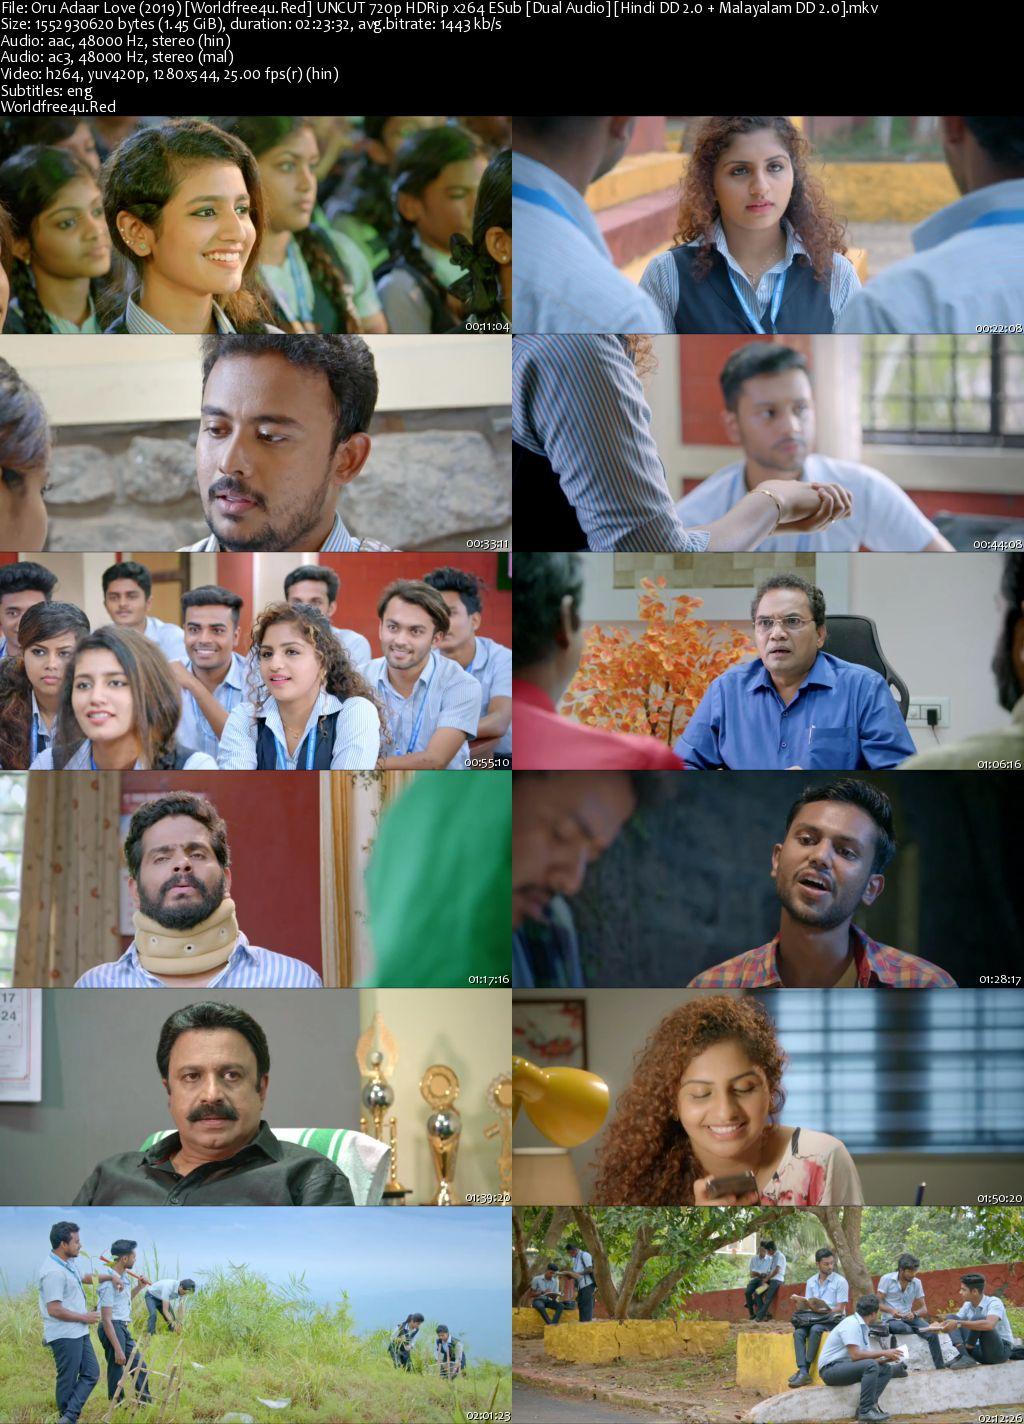 Oru Adaar Love 2019 Hindi Dubbed HDRip 720p